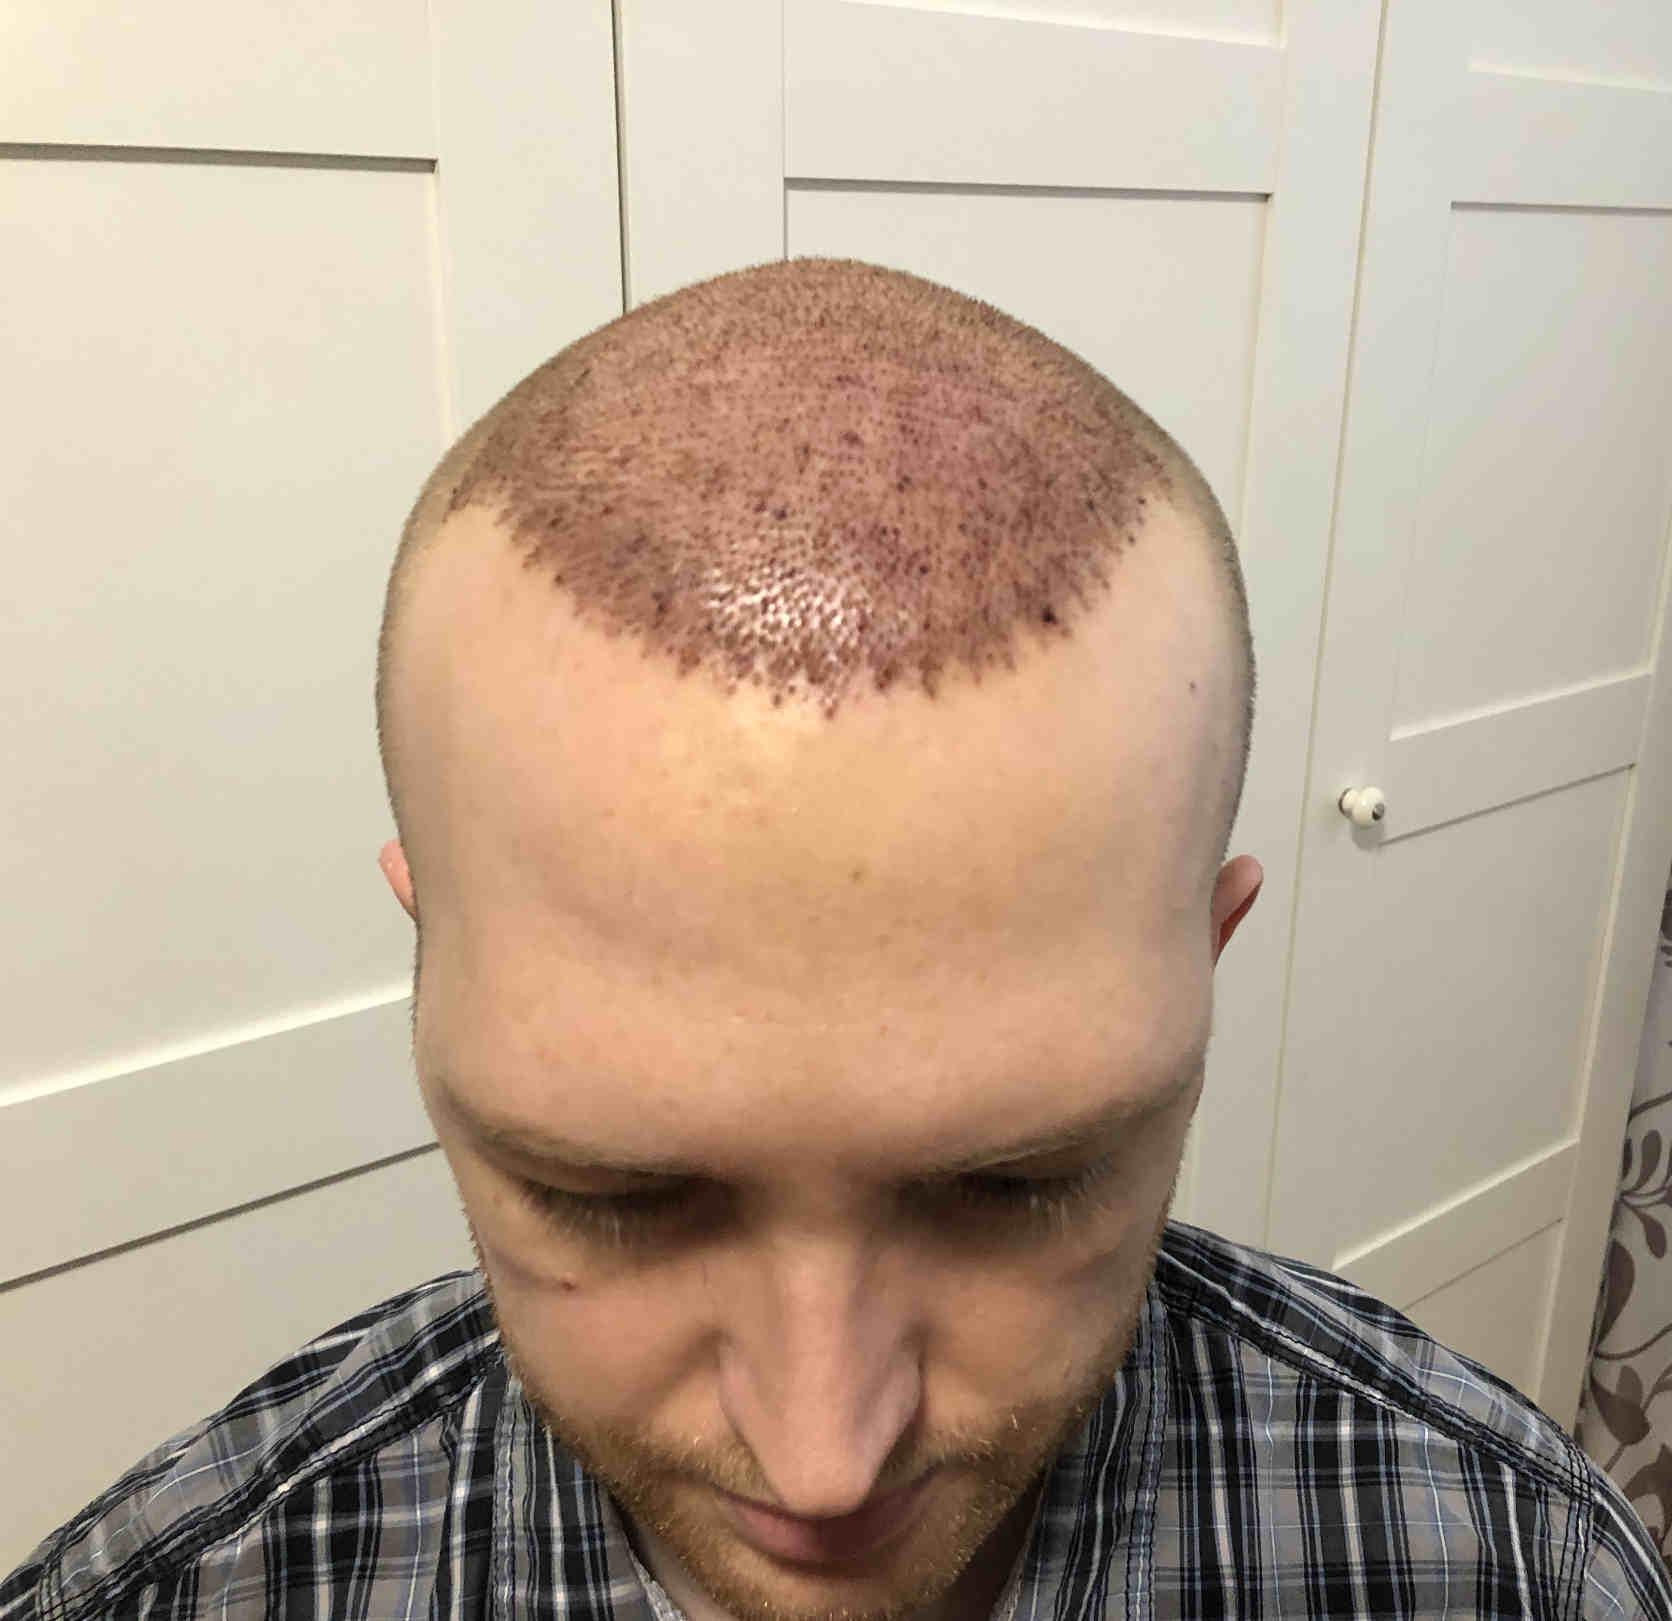 1 Tag nach Haartransplantation